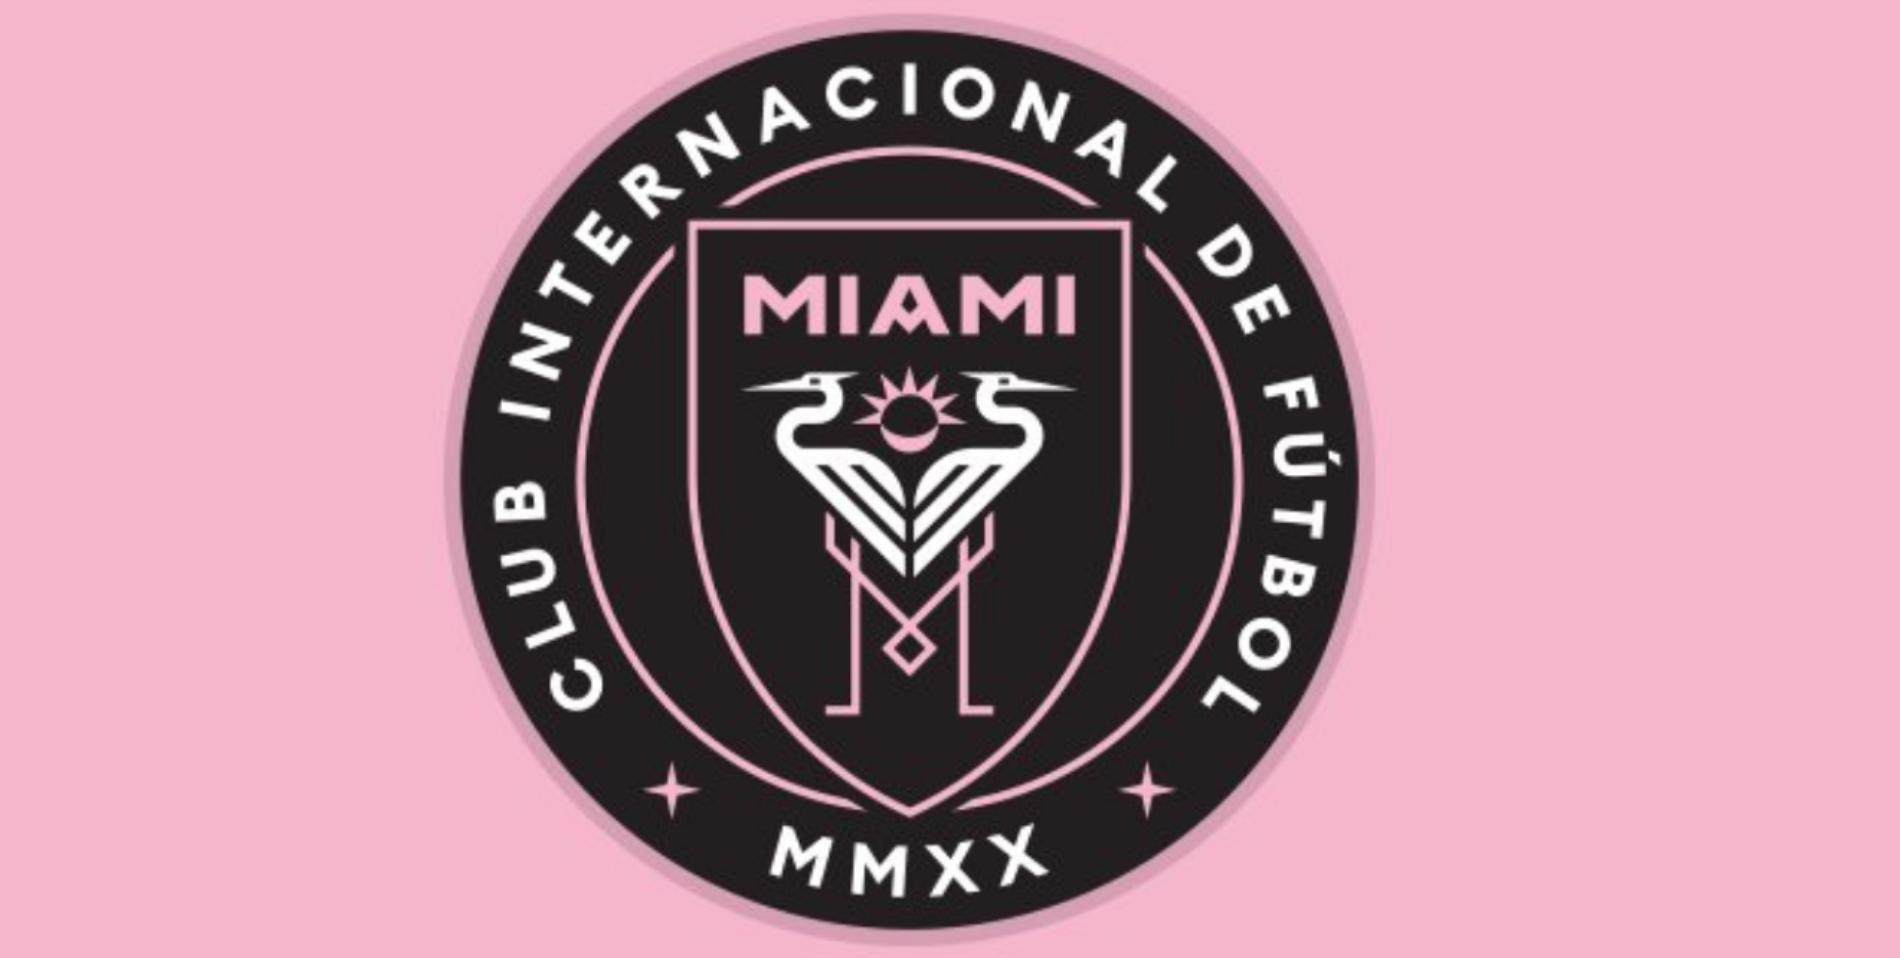 Naissance de l'Inter Miami CF fondé par David Beckham